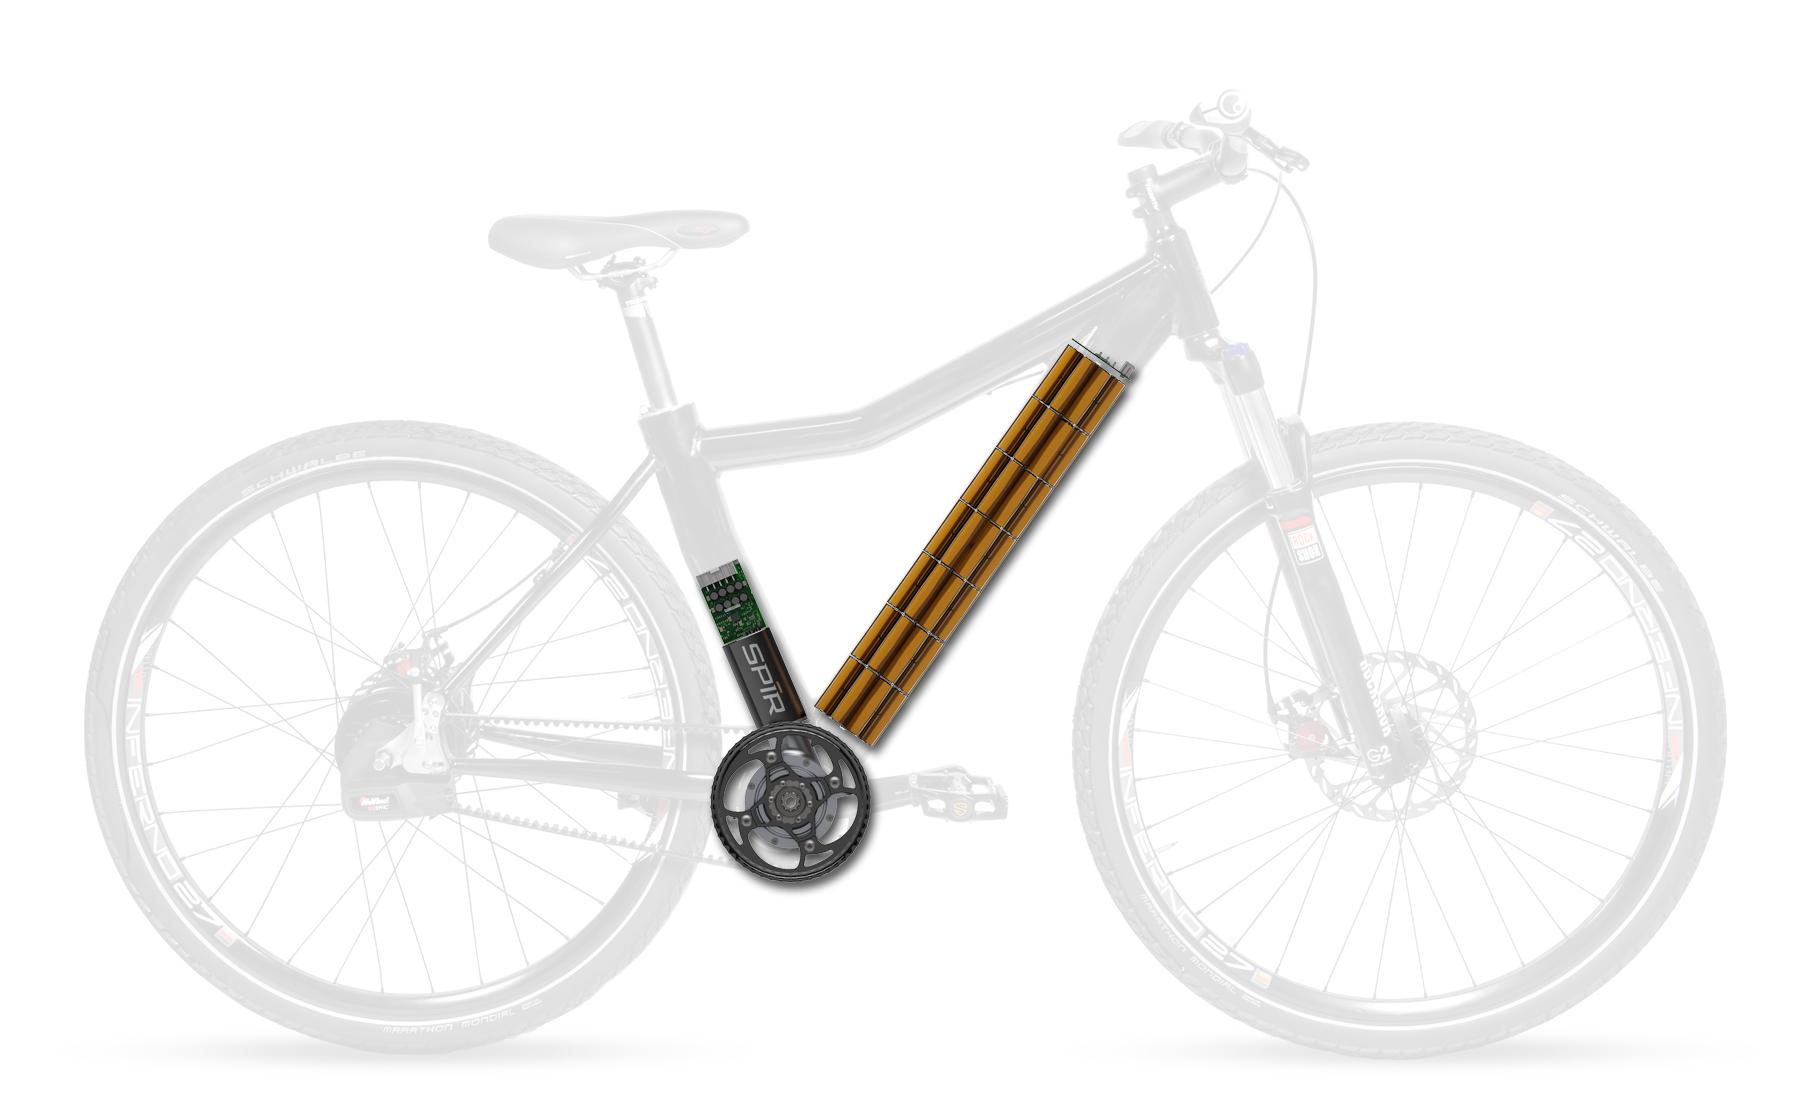 Spir-electronic-bike-Edited21